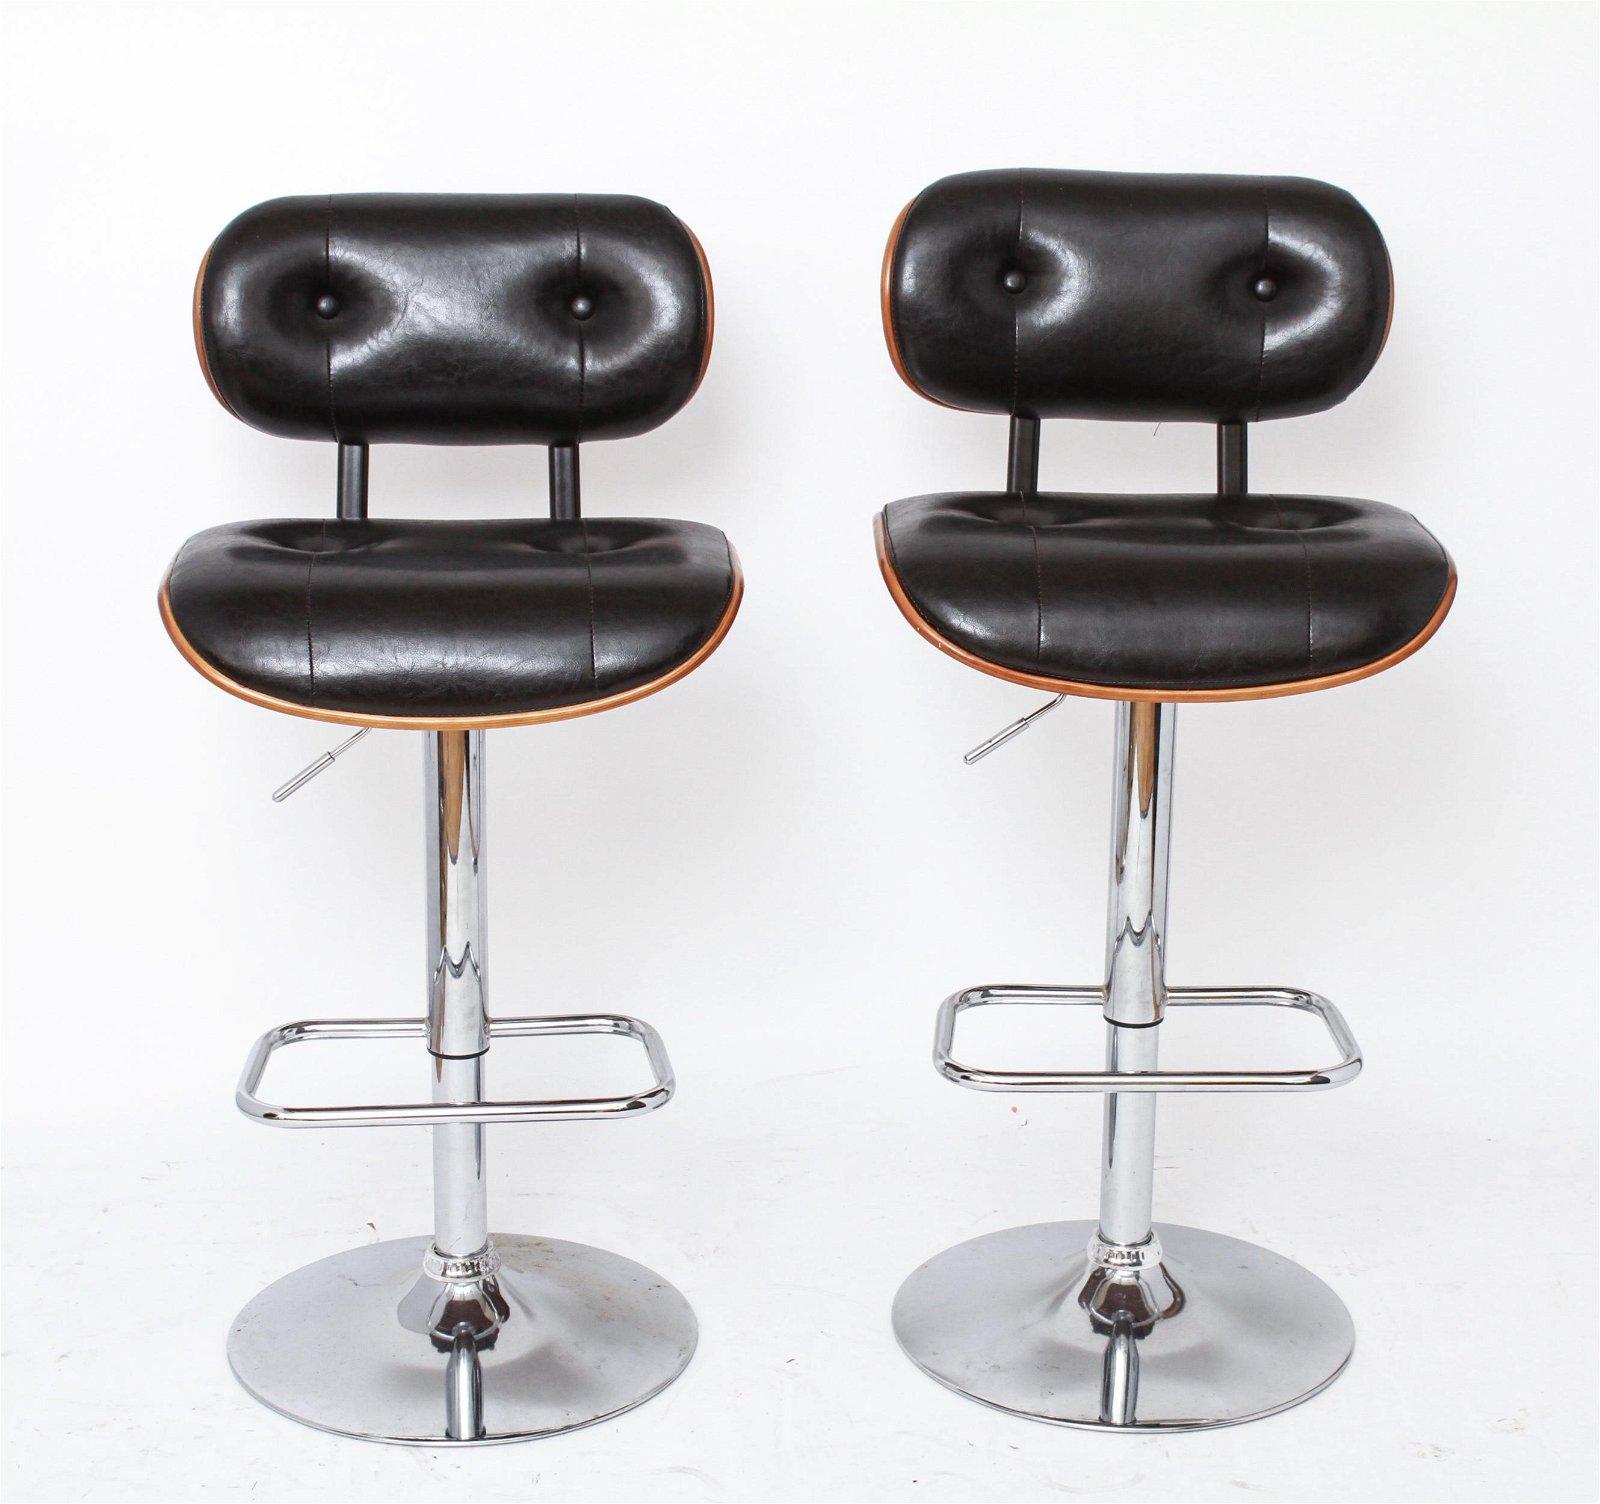 Herman Miller Style Modern Bar Stools, Pair